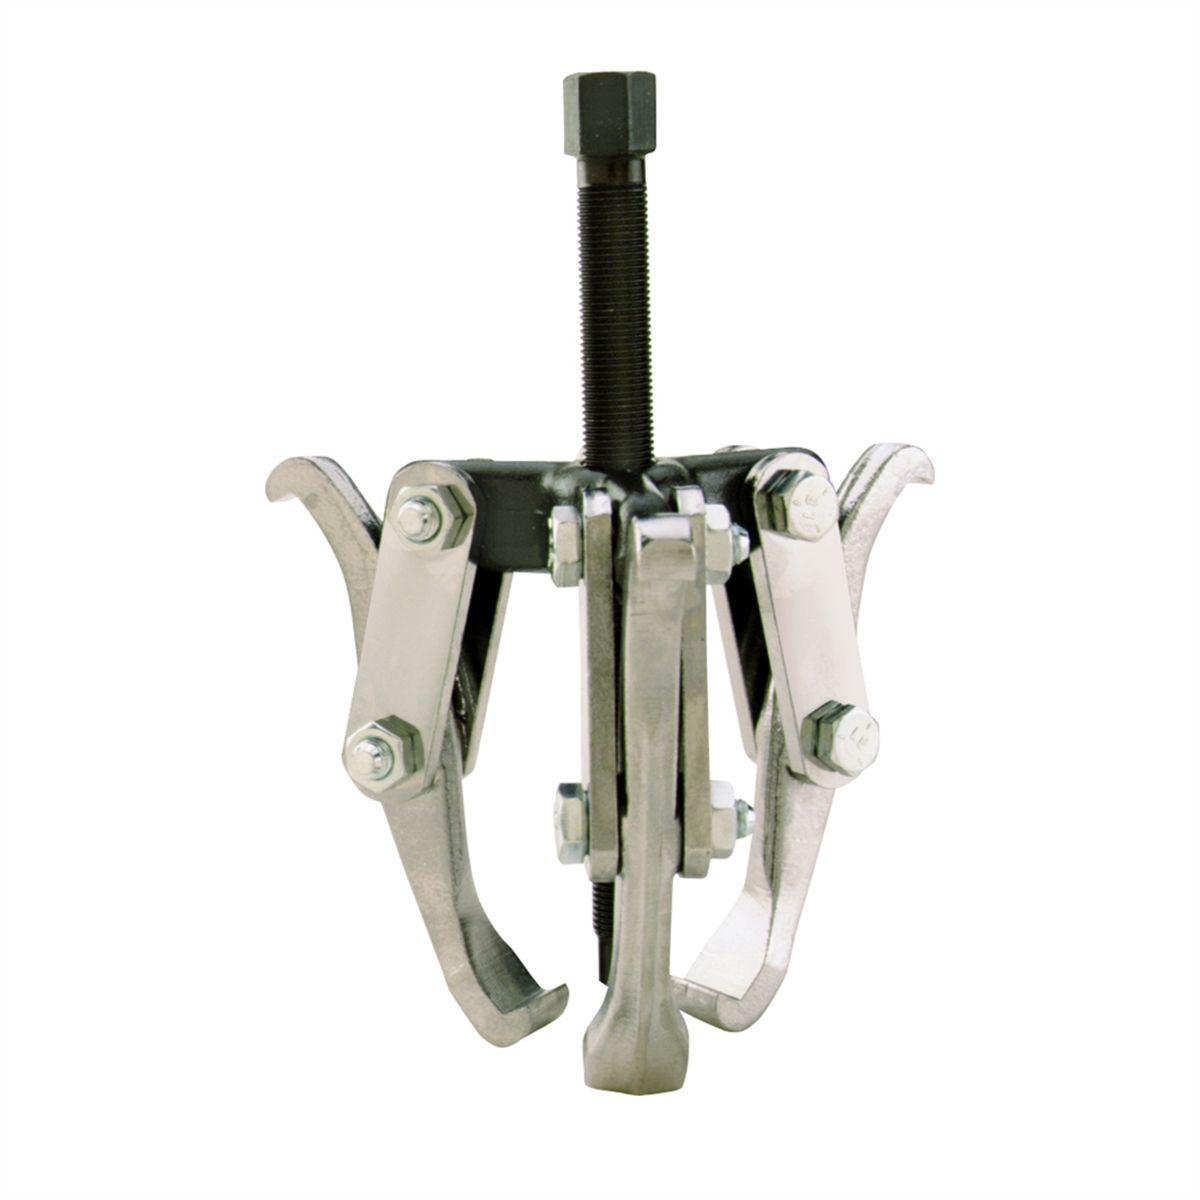 OTC 7 Ton 1038 Long 2//3 Jaw Mechanical Grip-O-Matic Puller